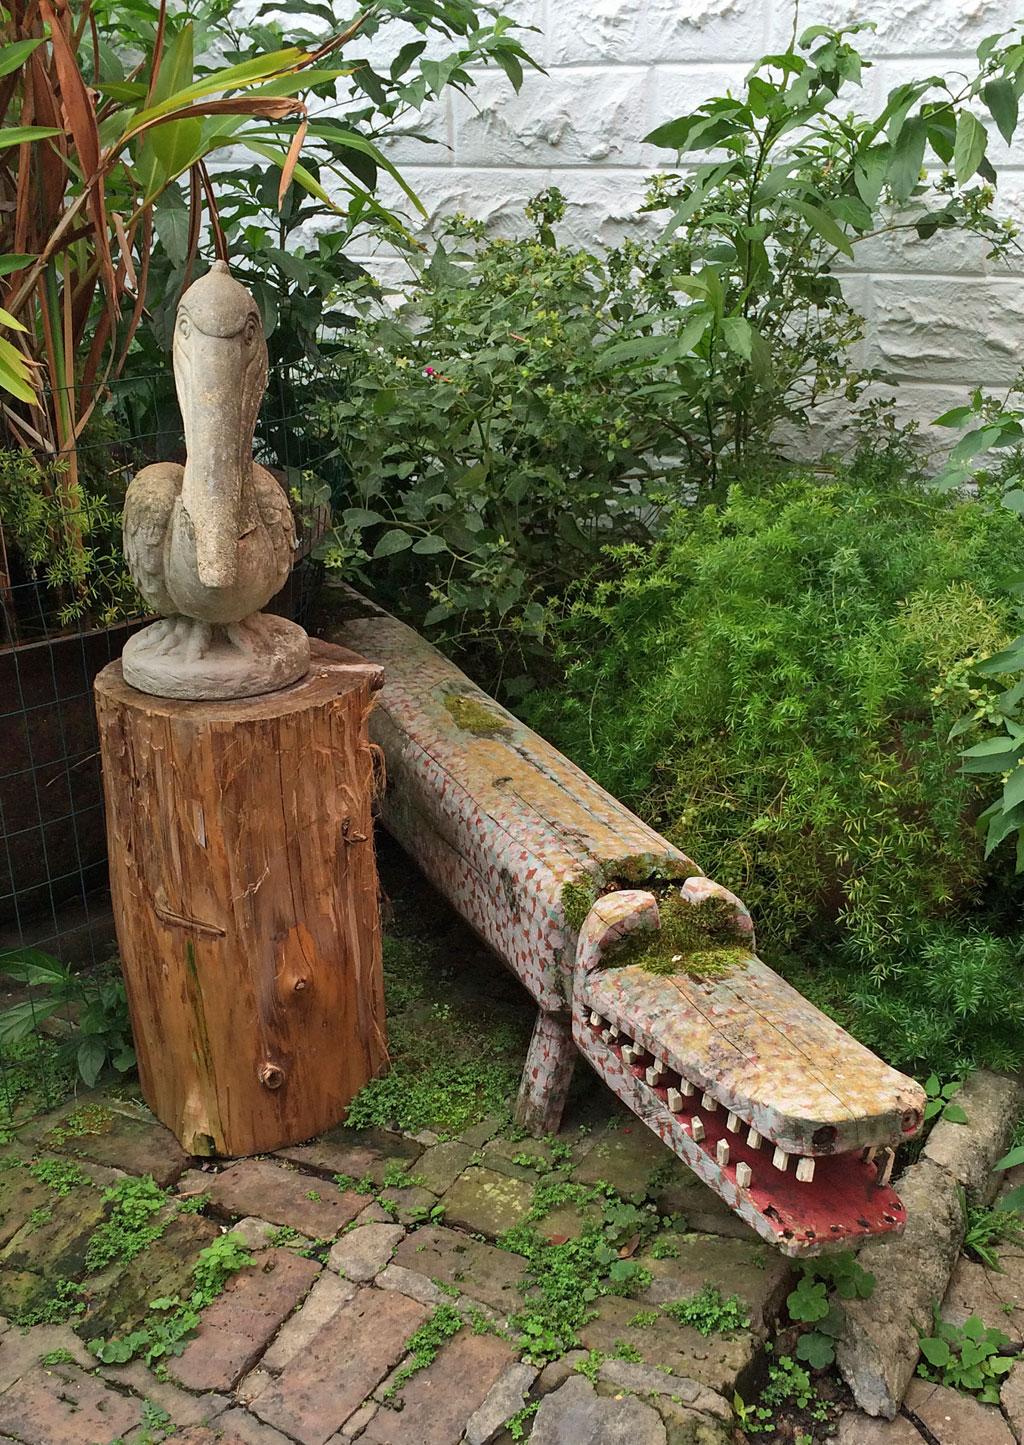 ... 1024 × 1445 In Garden Companions: Pelican And Alligator